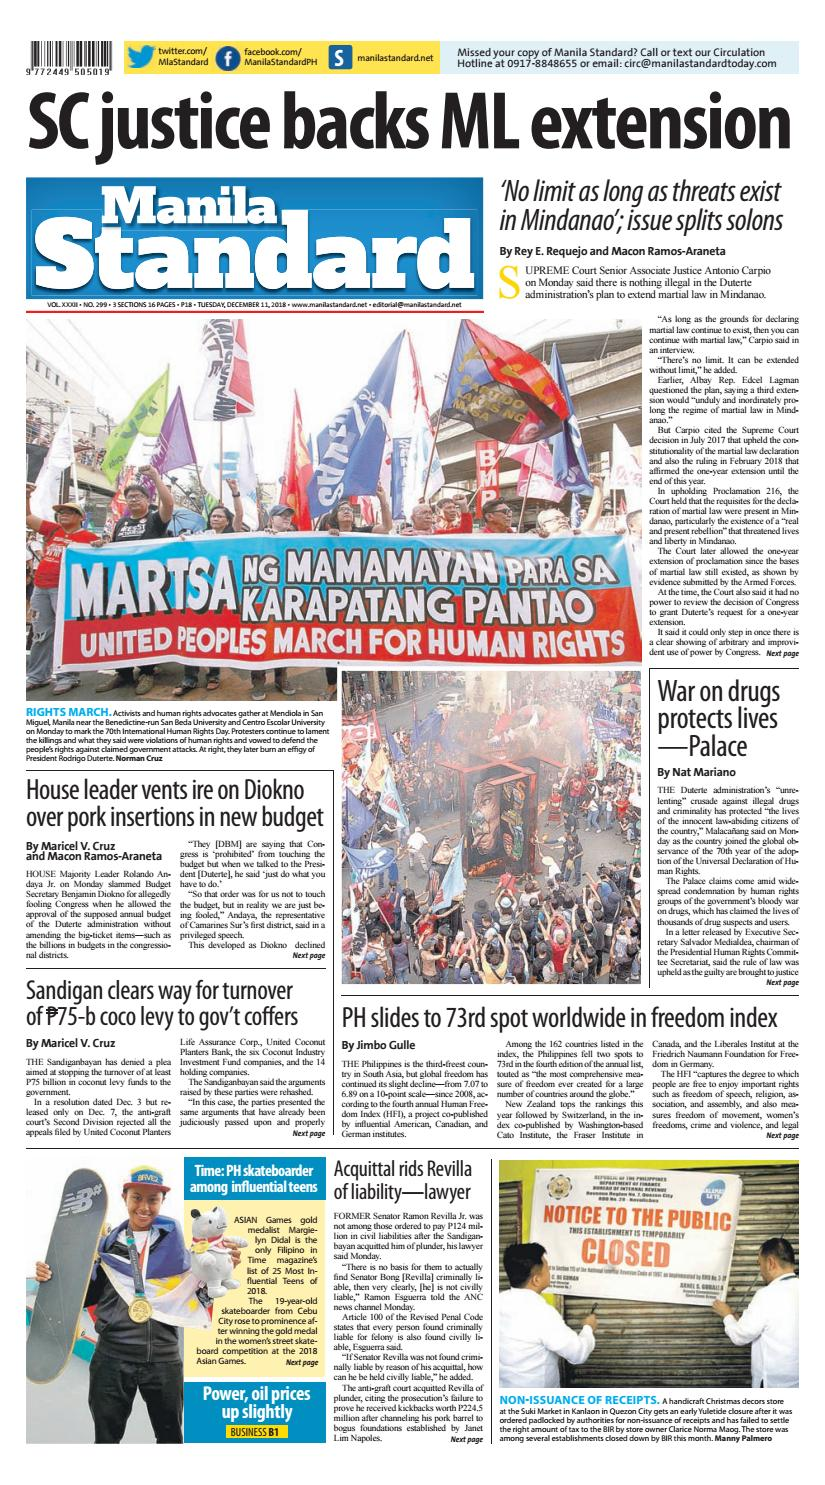 Manila Standard - 2018 December 11 - Tuesday by Manila Standard - issuu